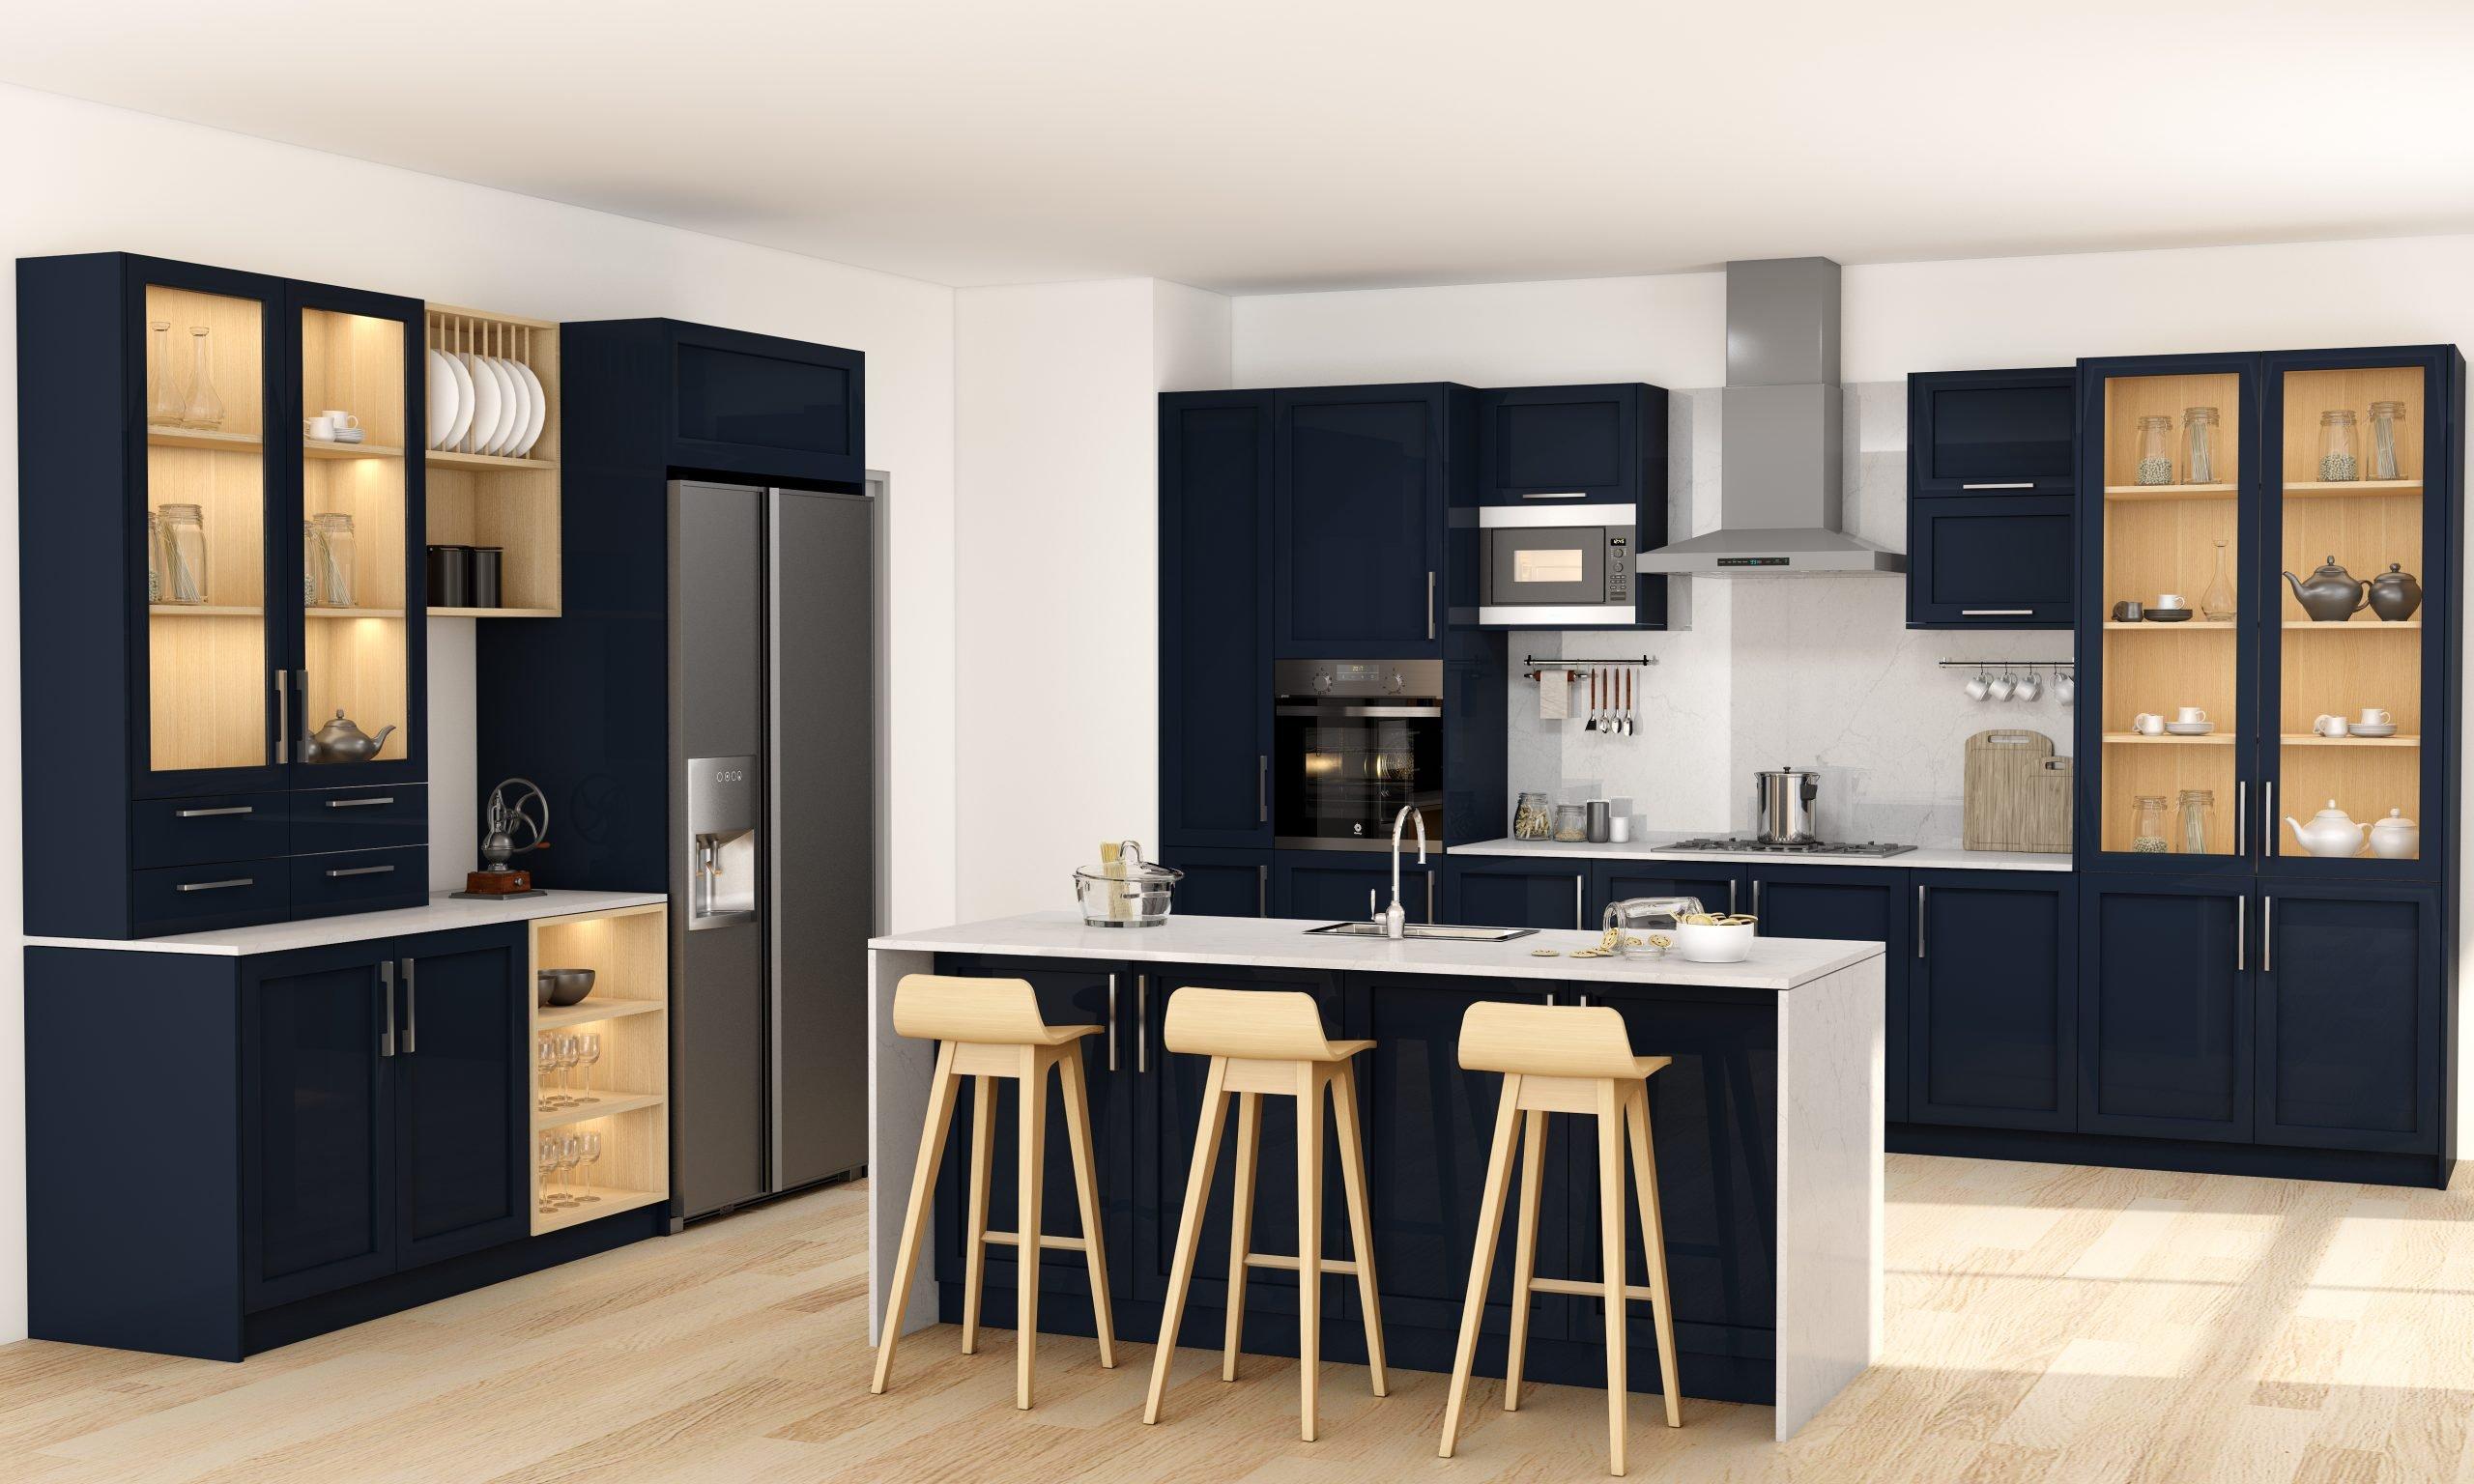 Modern Kitchen in Indigo Blue Kaisersberg Oak and Breakfast Bar